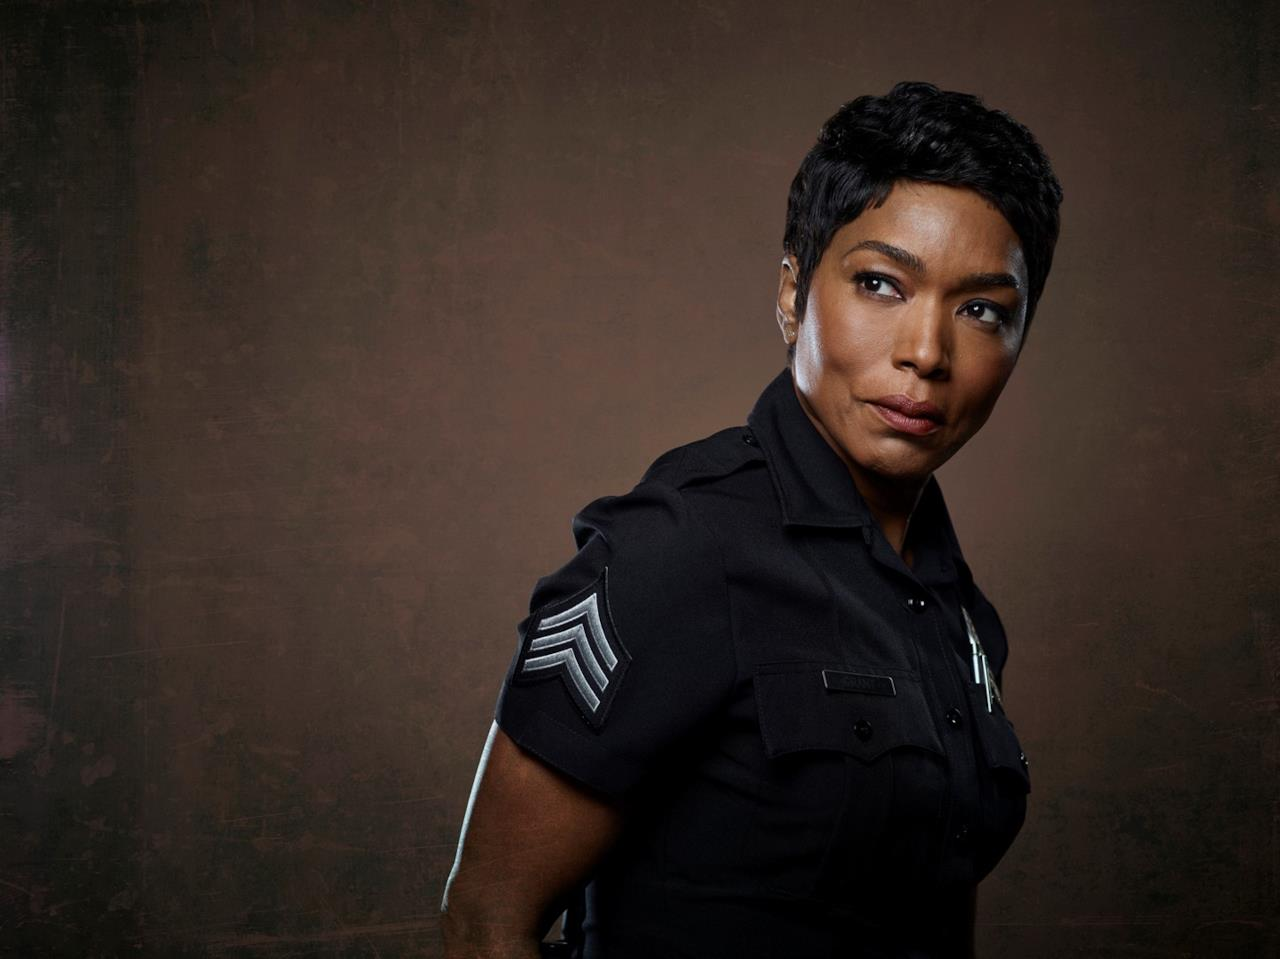 9-1-1 911 Angela Bassett è Athena Grant 2